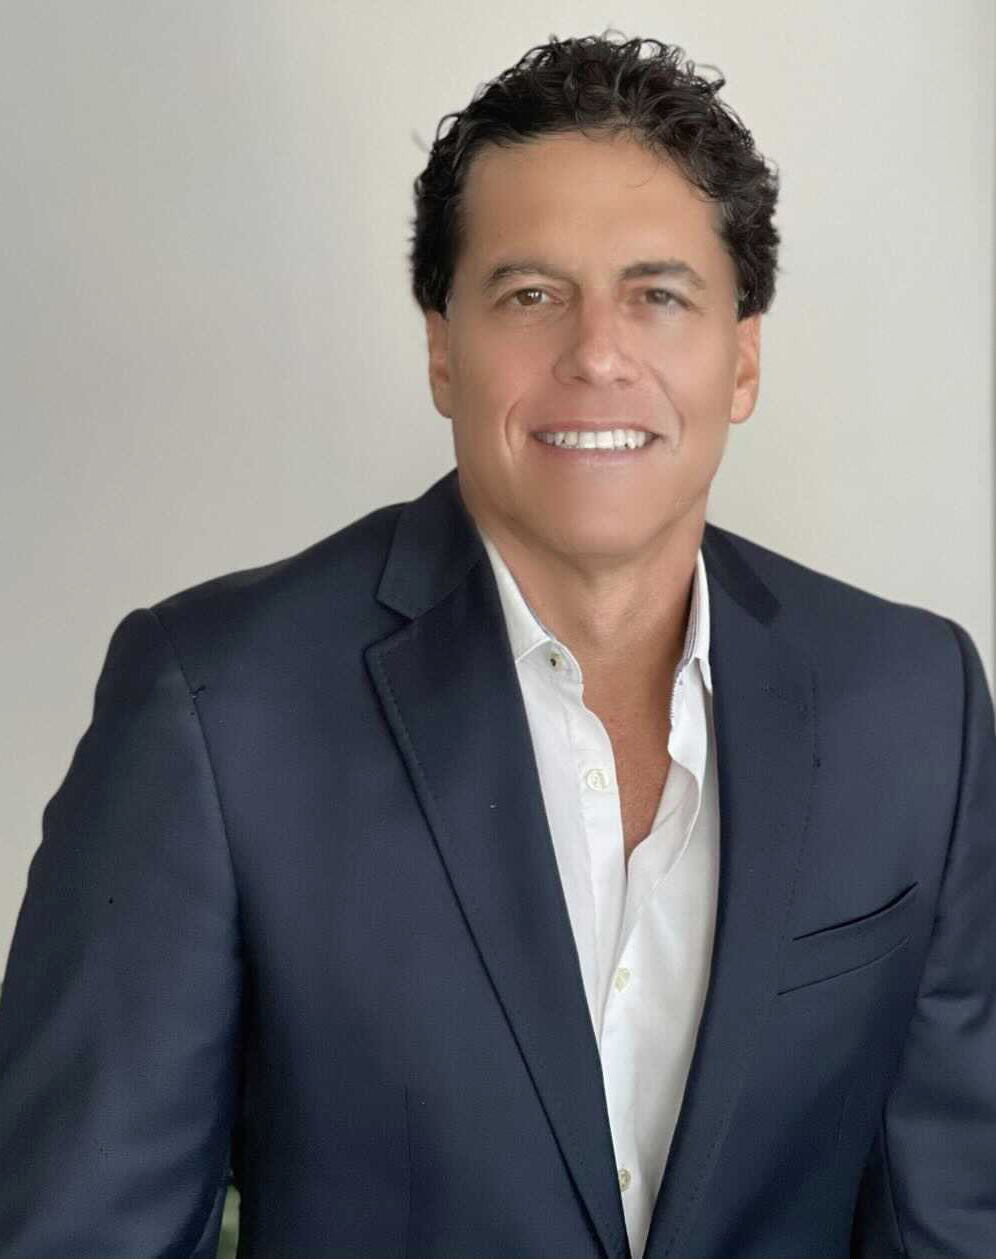 Jaime Ramirez - founder and CEO Preventor